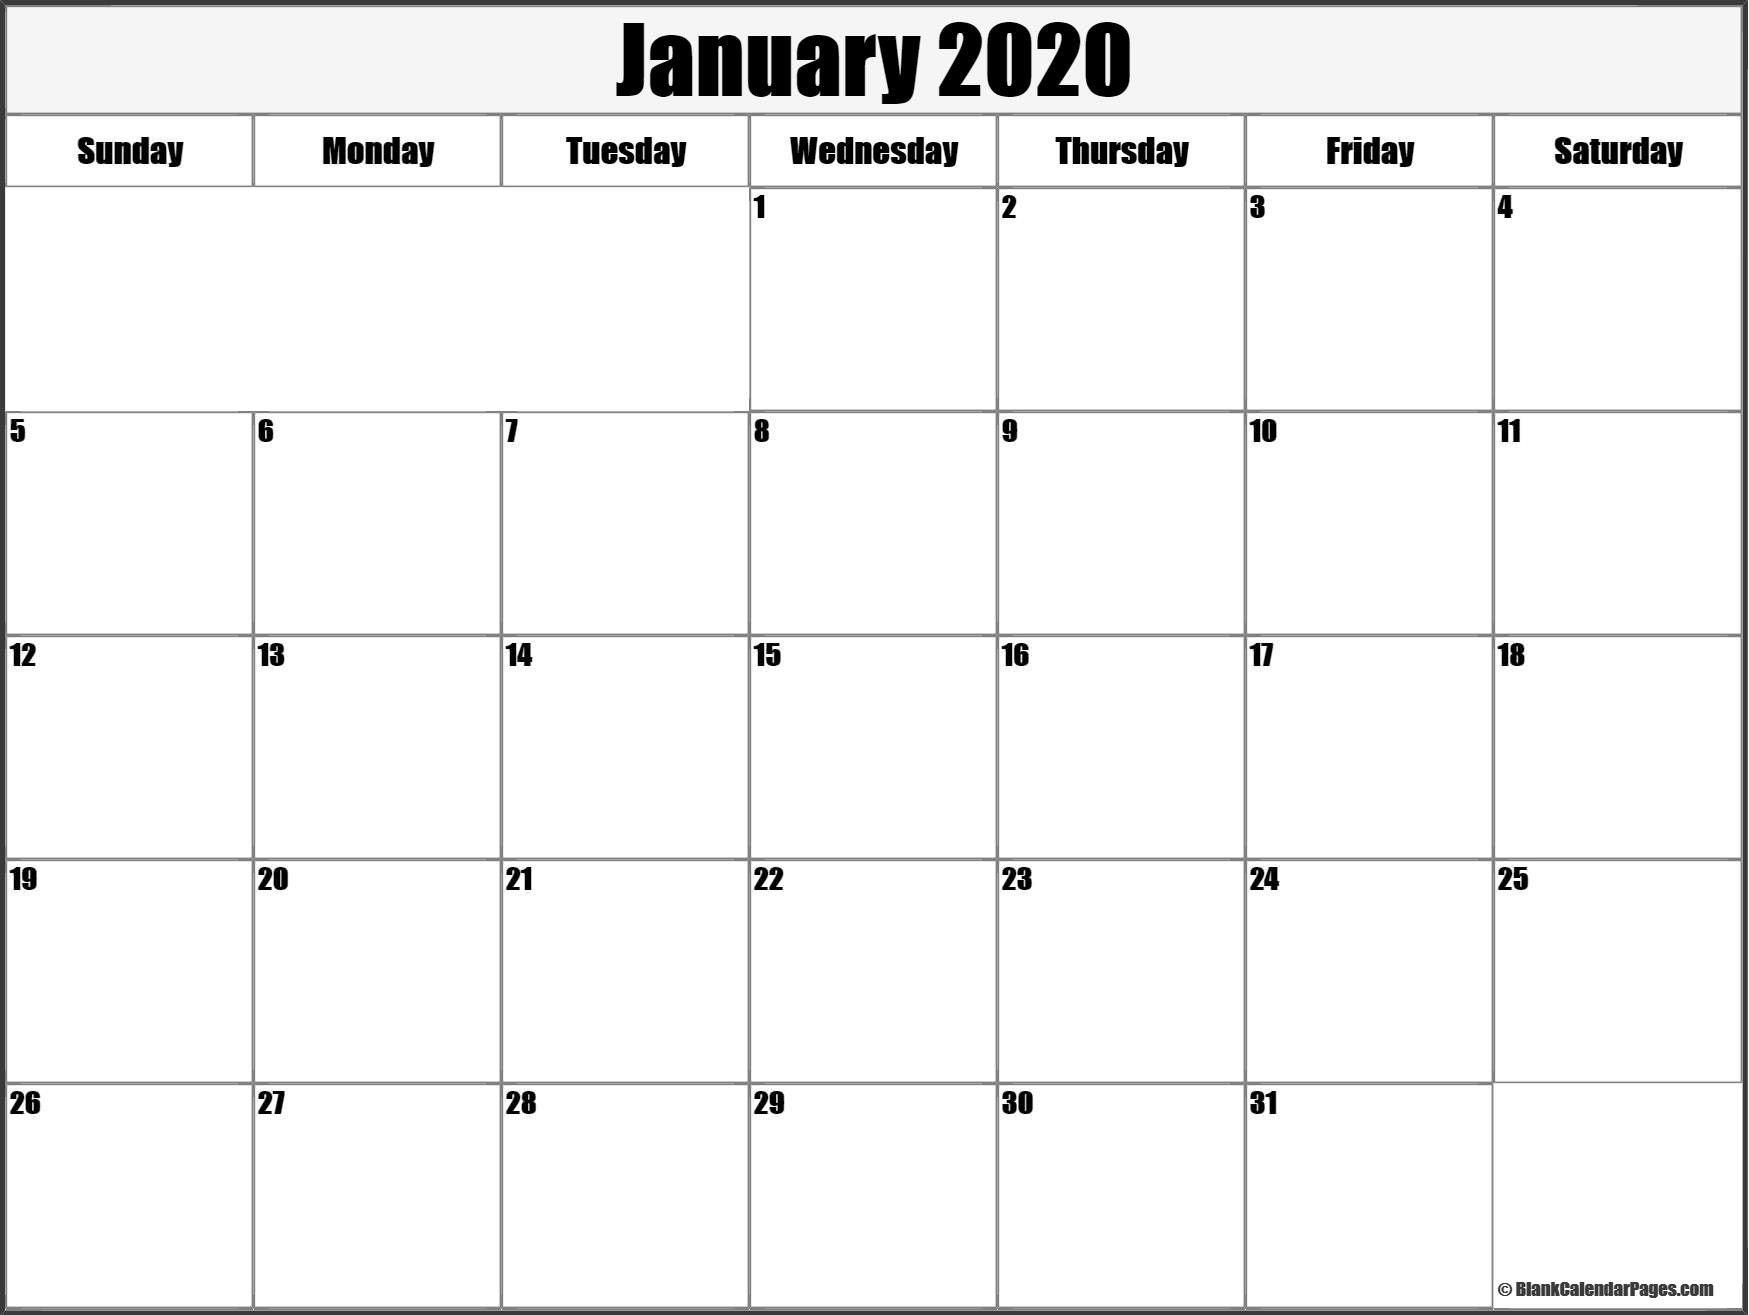 January 2020 Calendar Template january january2020